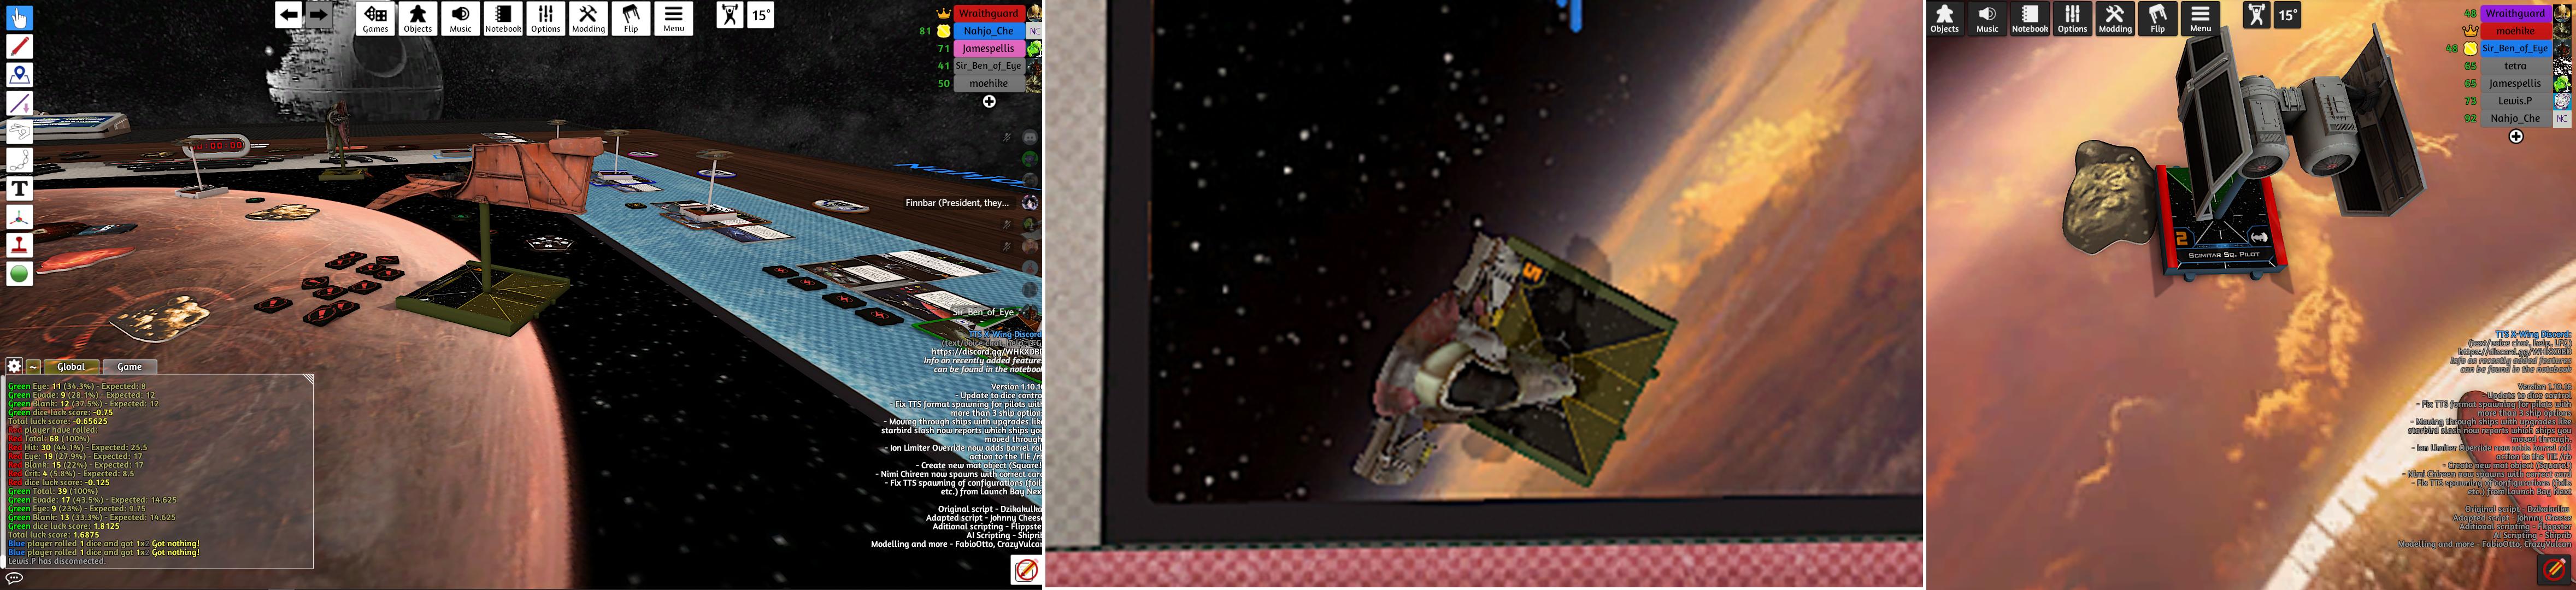 Xwing screenshots, captions in text